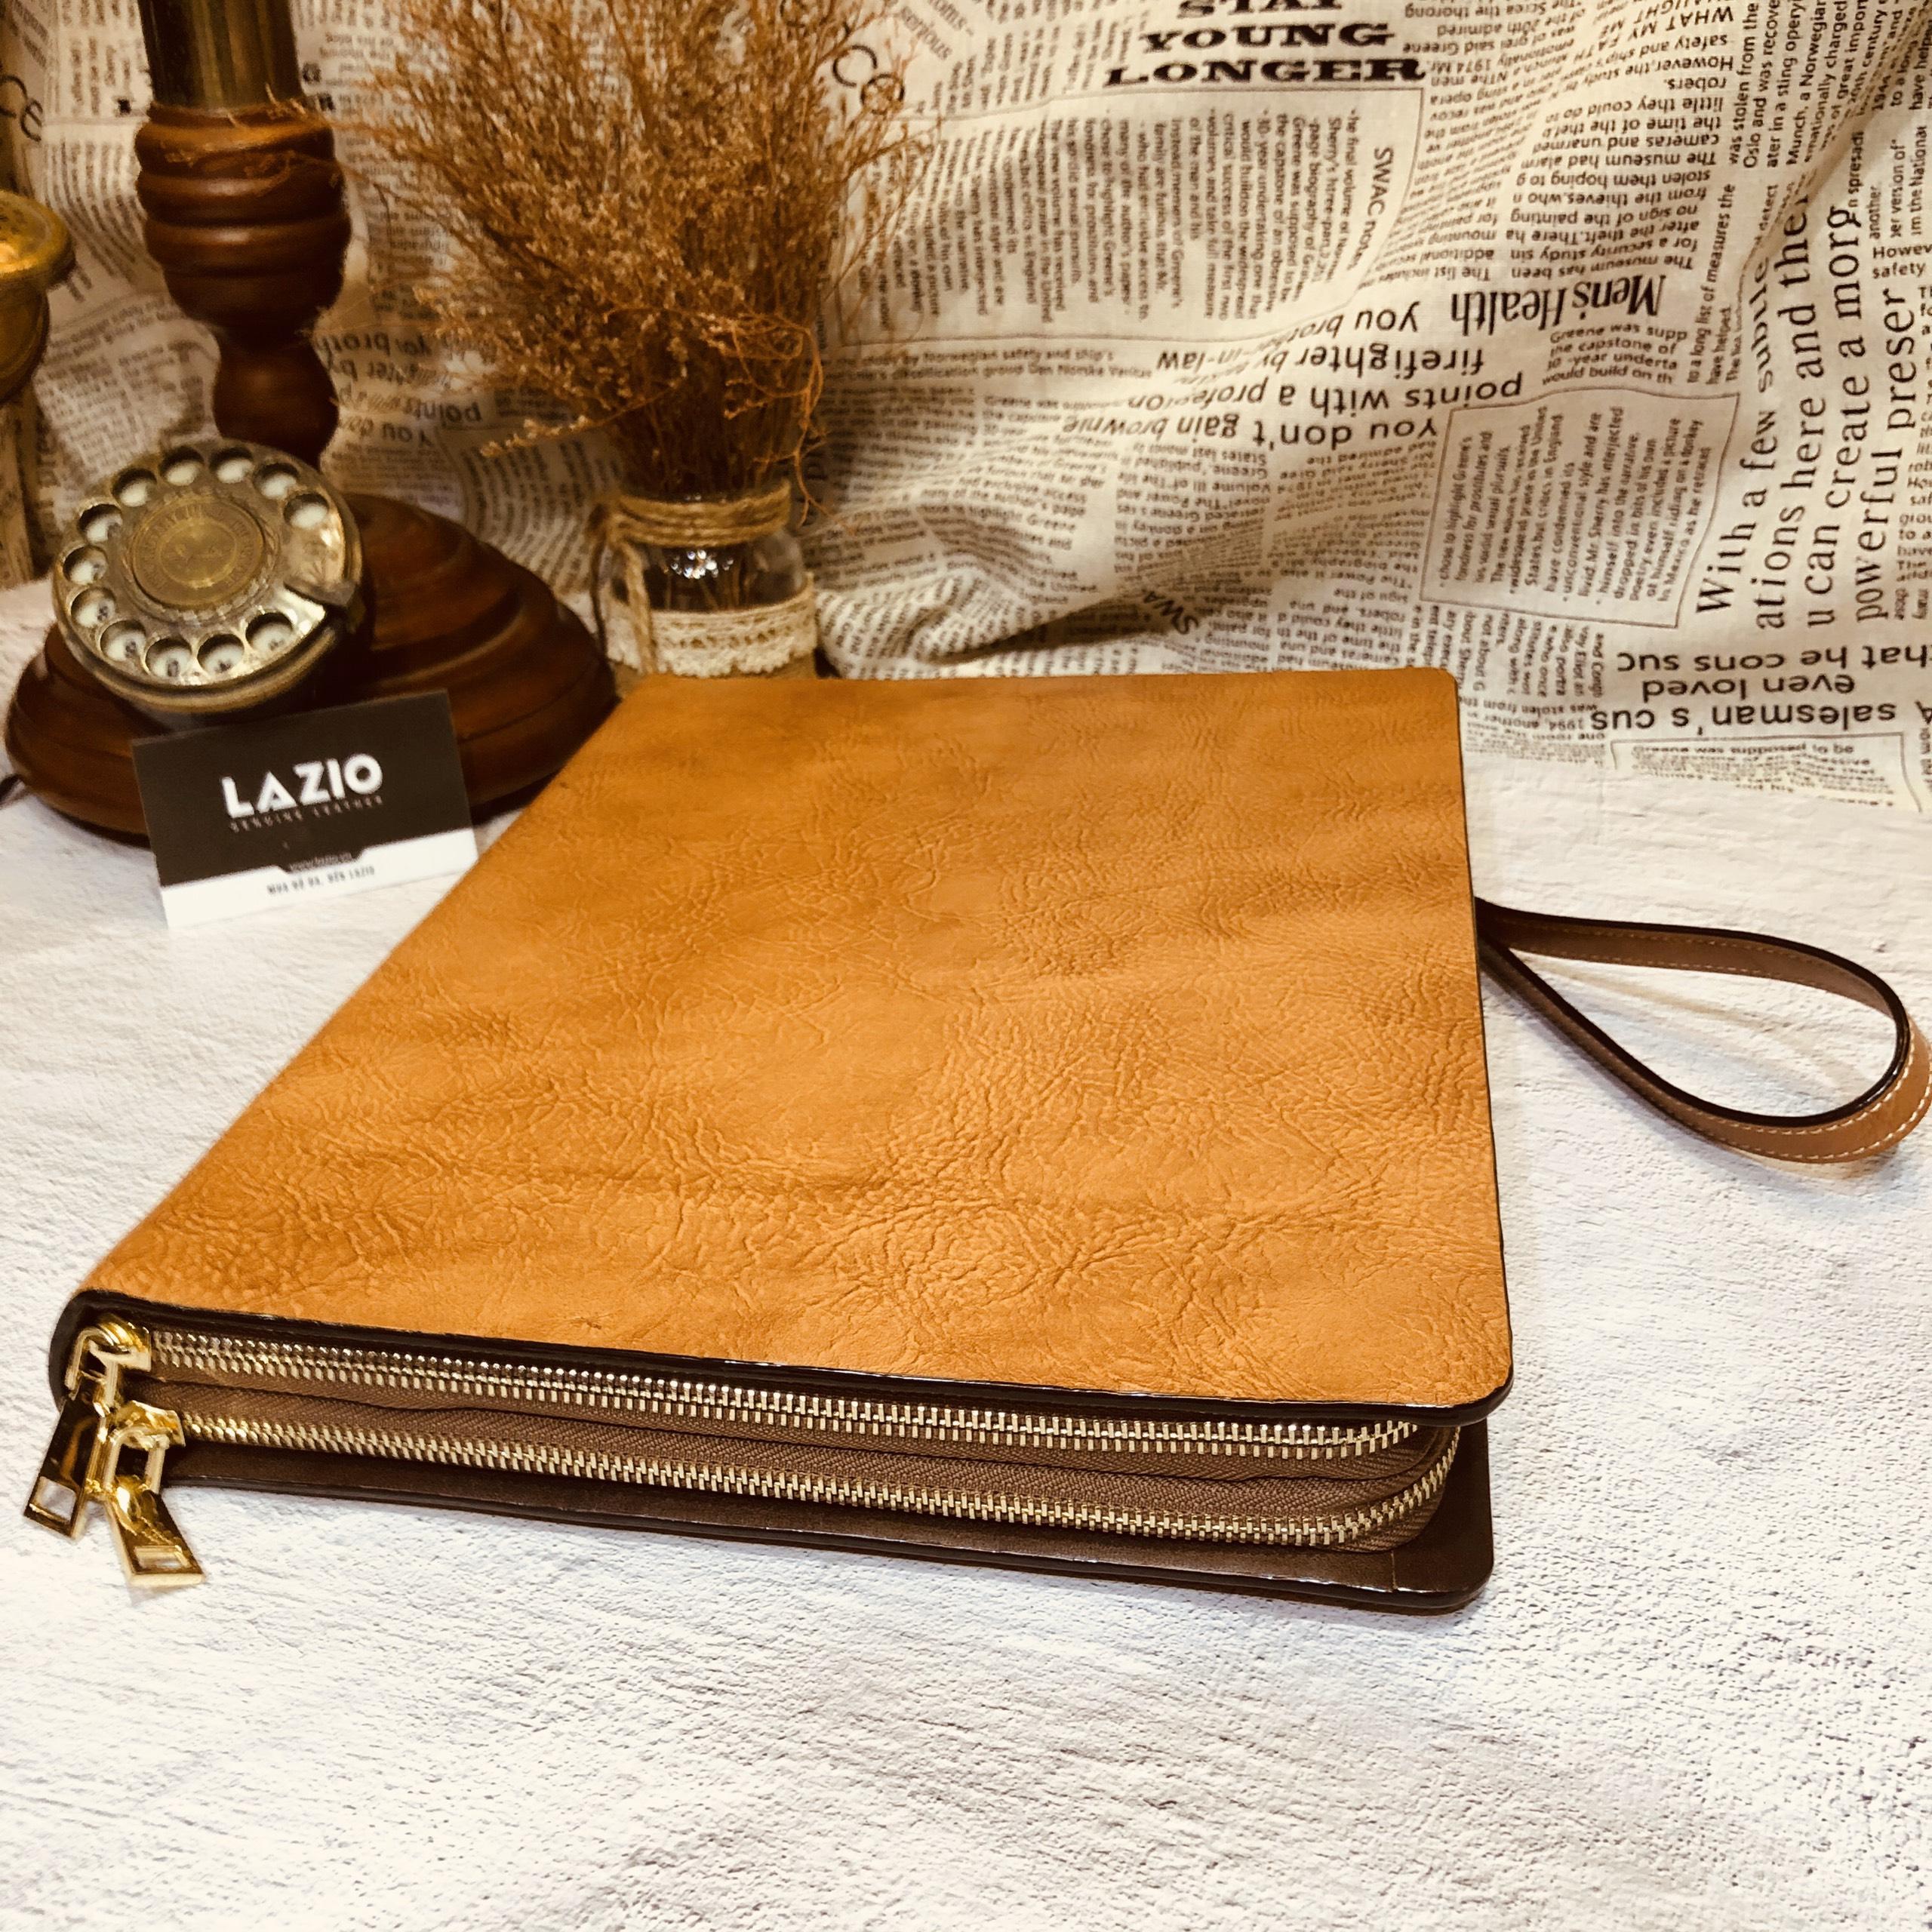 Túi hồ sơ da bò cao cấp 822 da bò xịn đựng giấy A4, macbook 13.3''